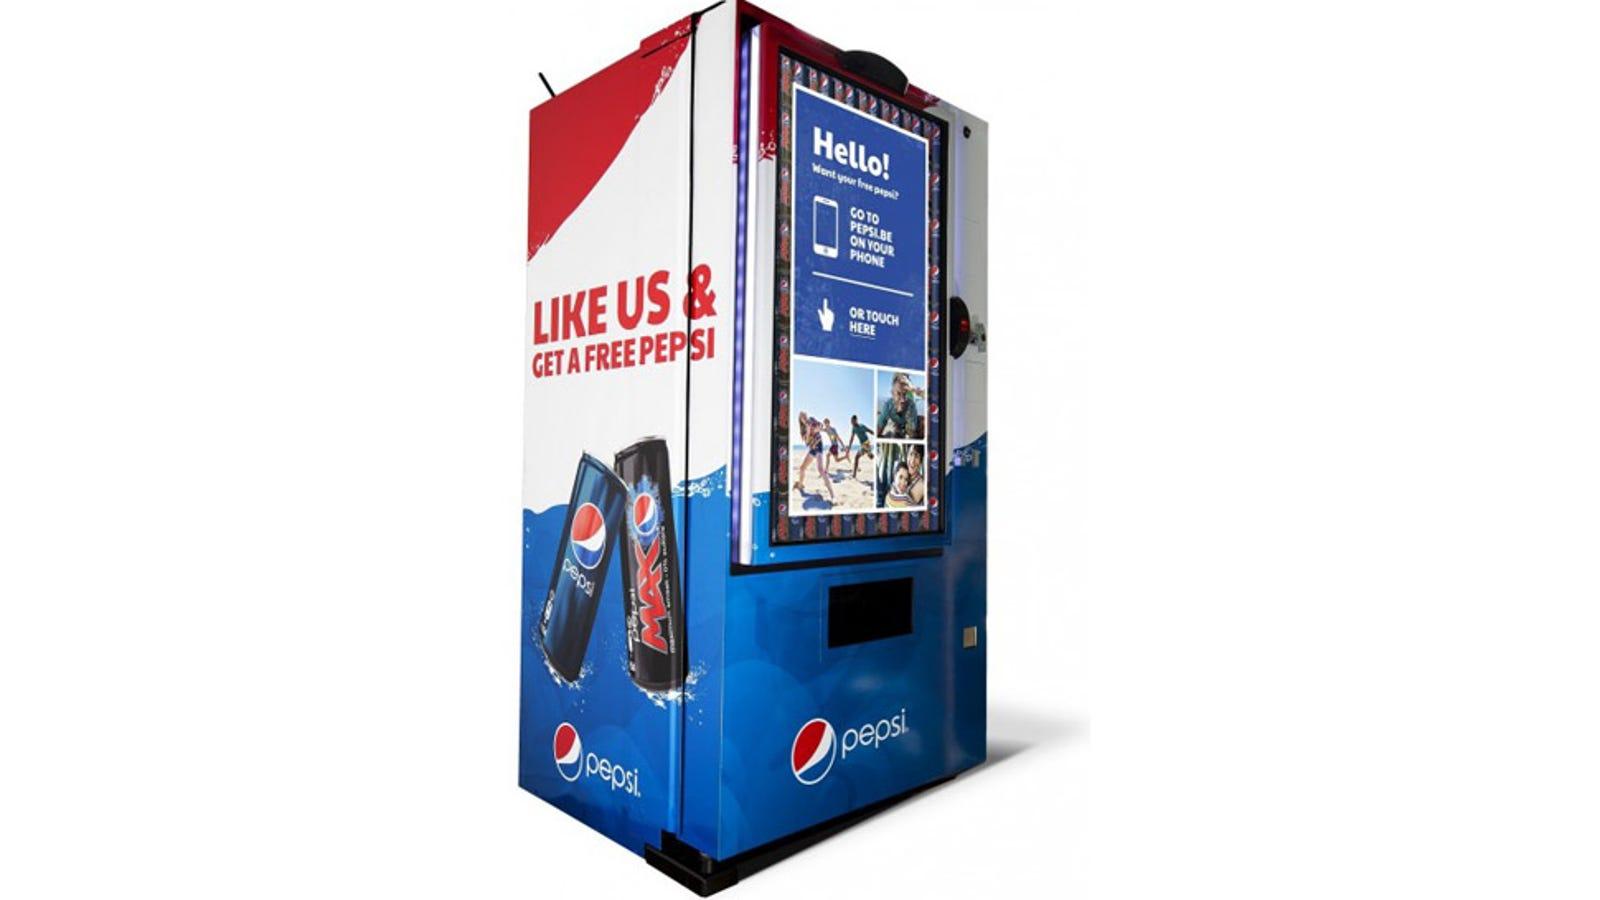 Esta máquina de Pepsi funciona con 'Me gusta'